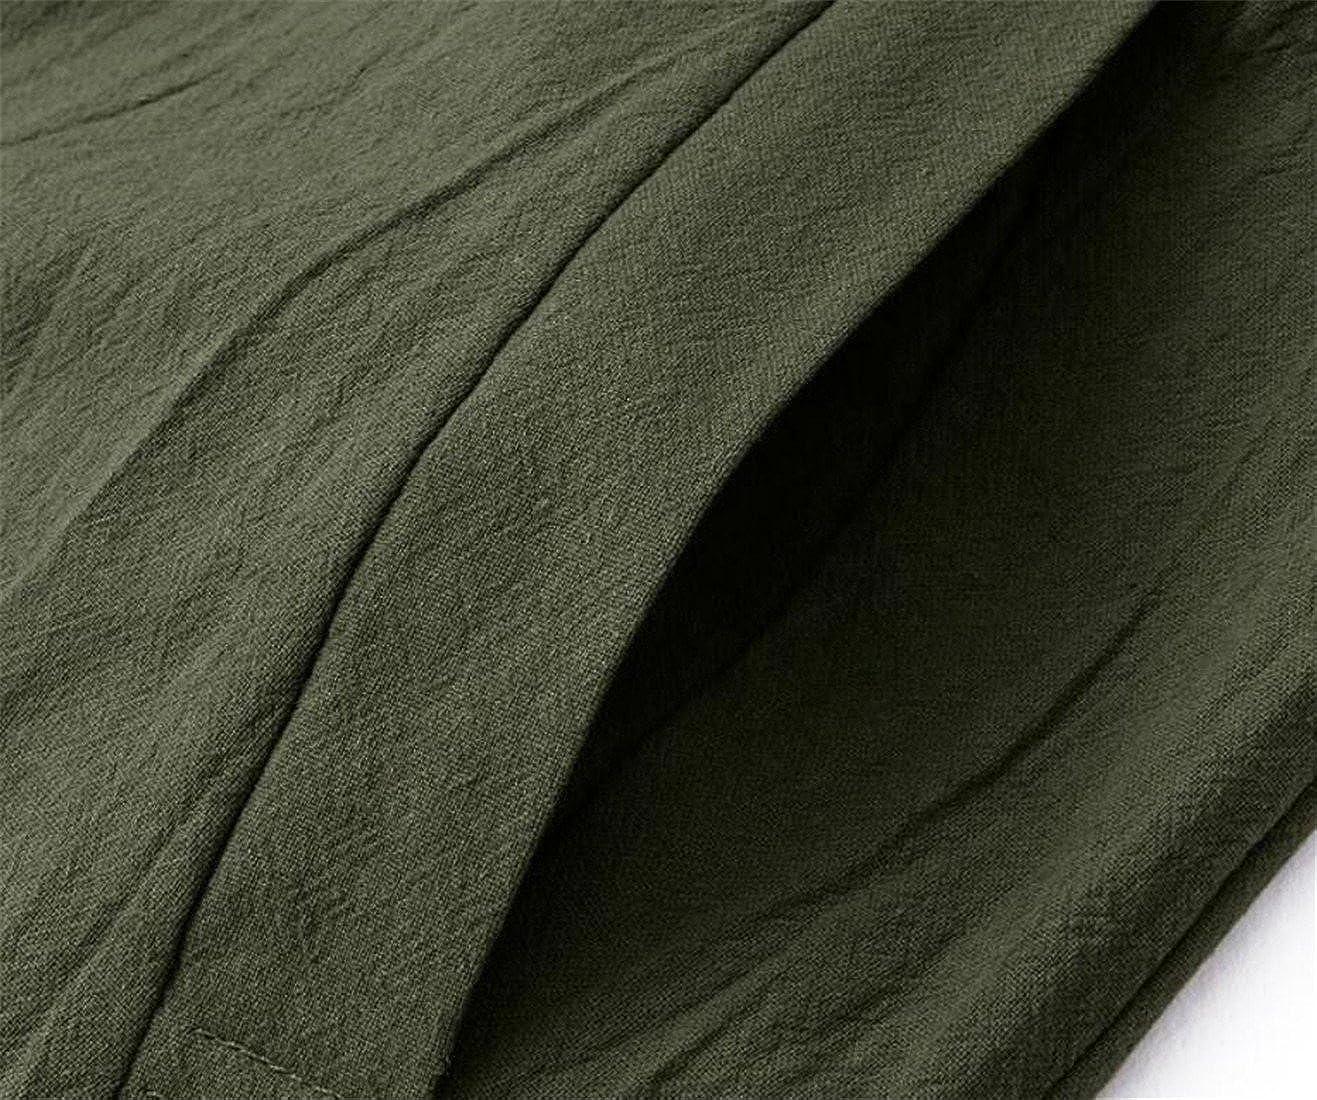 XXBlosom Women Relaxed-Fit Palazzo Pants Linen Jumpsuits Suspender Overalls